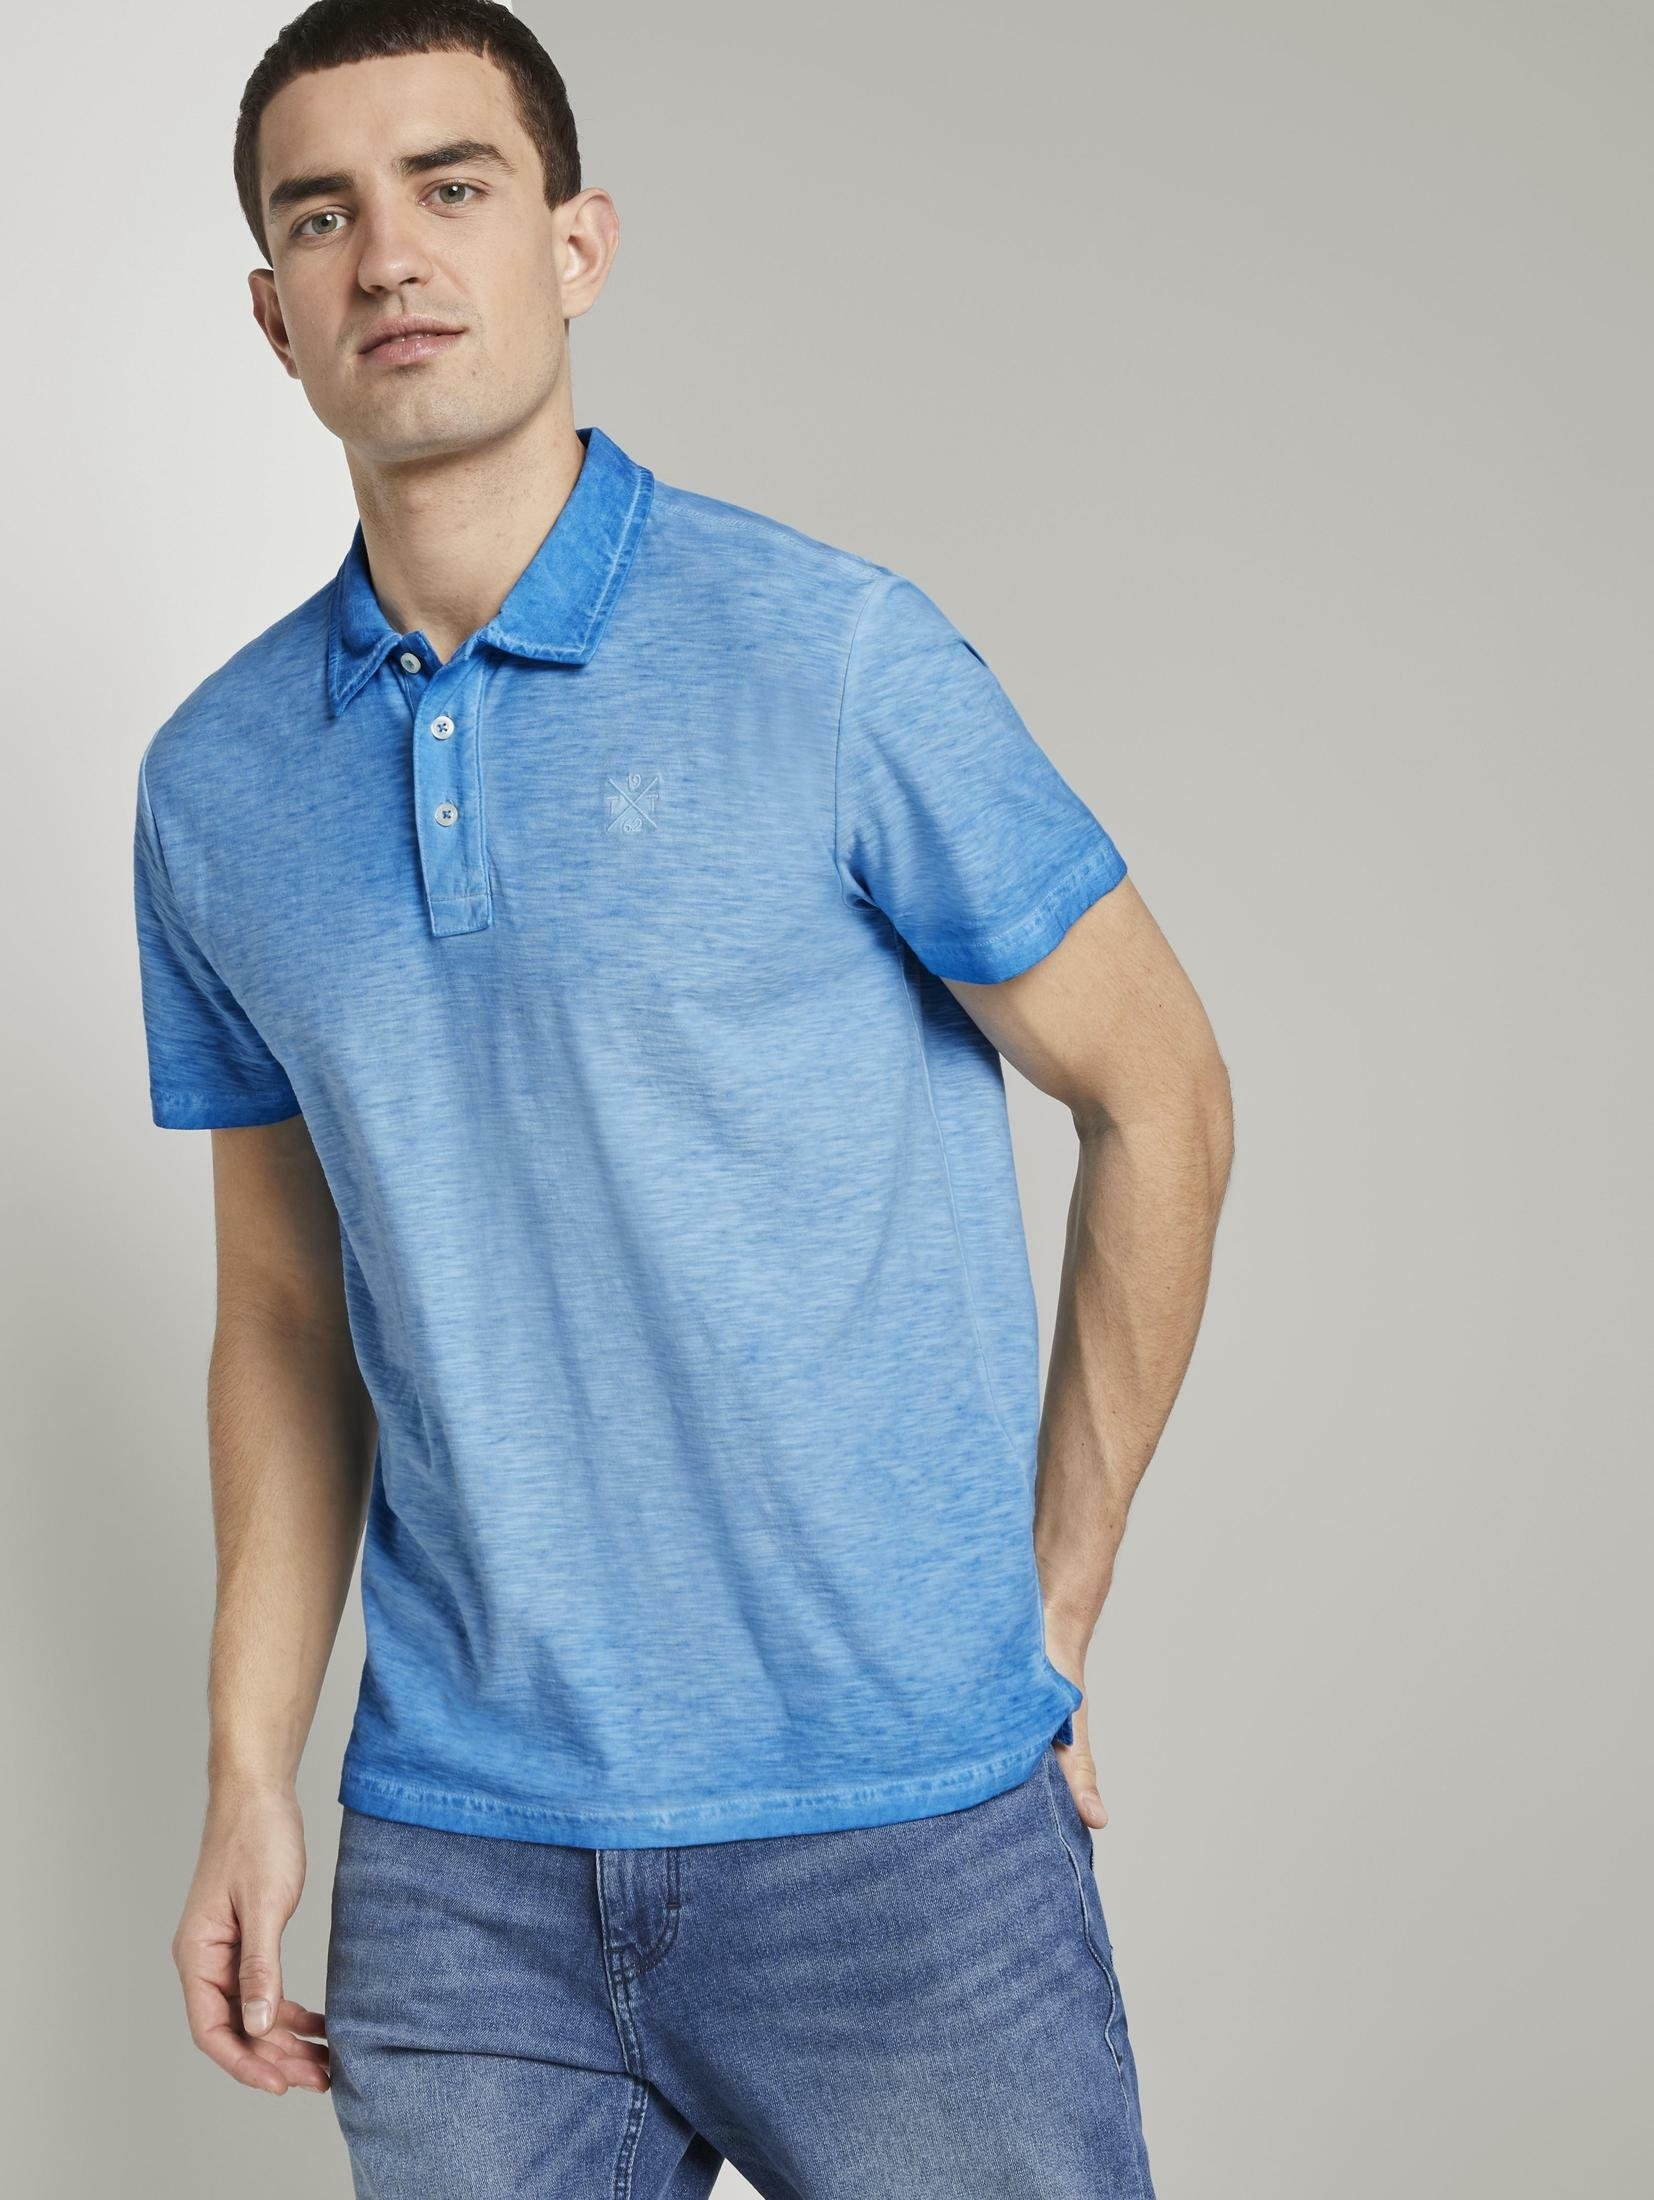 Tom Tailor poloshirt »Meliertes Poloshirt im Washed-Look« nu online kopen bij OTTO